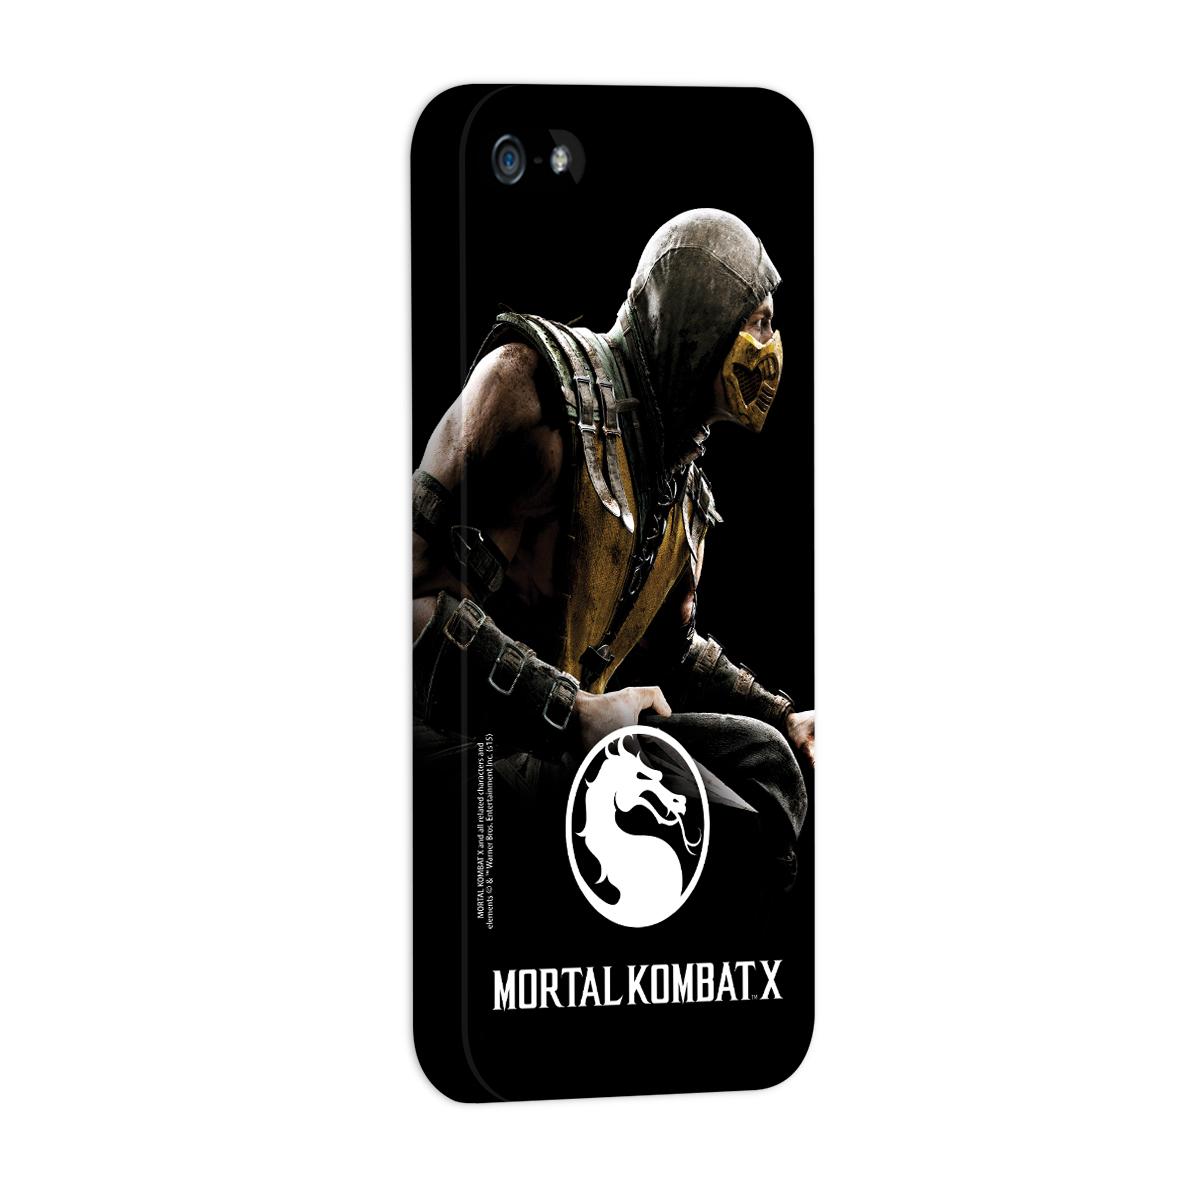 Capa para iPhone 5/5S Mortal Kombat X Capa  - bandUP Store Marketplace